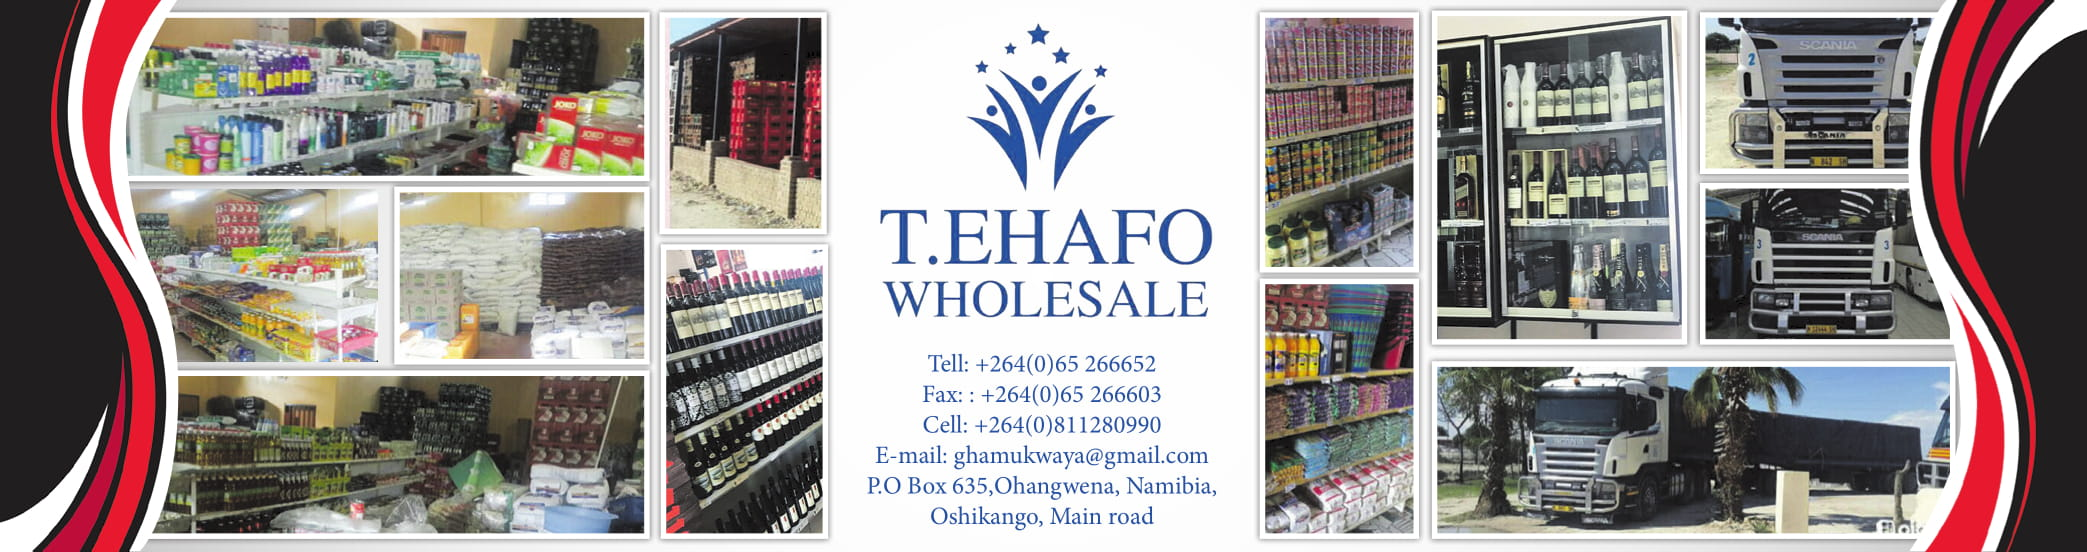 Ehafo Group of Companies